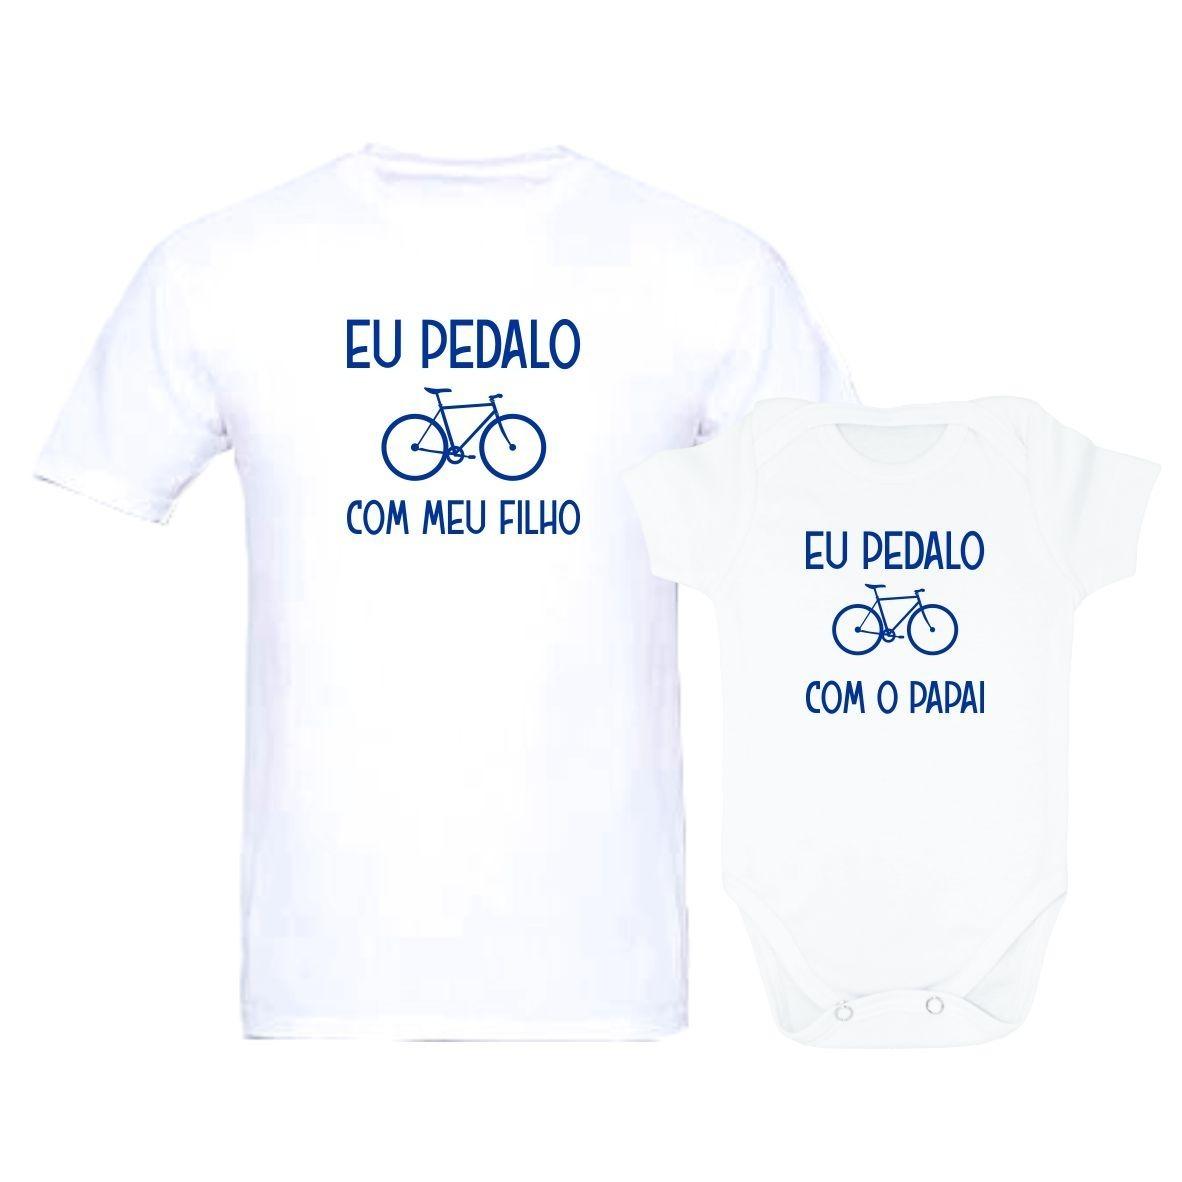 dd3622869 kit camiseta tal pai tal filho(a) body pedalo com o papai. Carregando zoom.